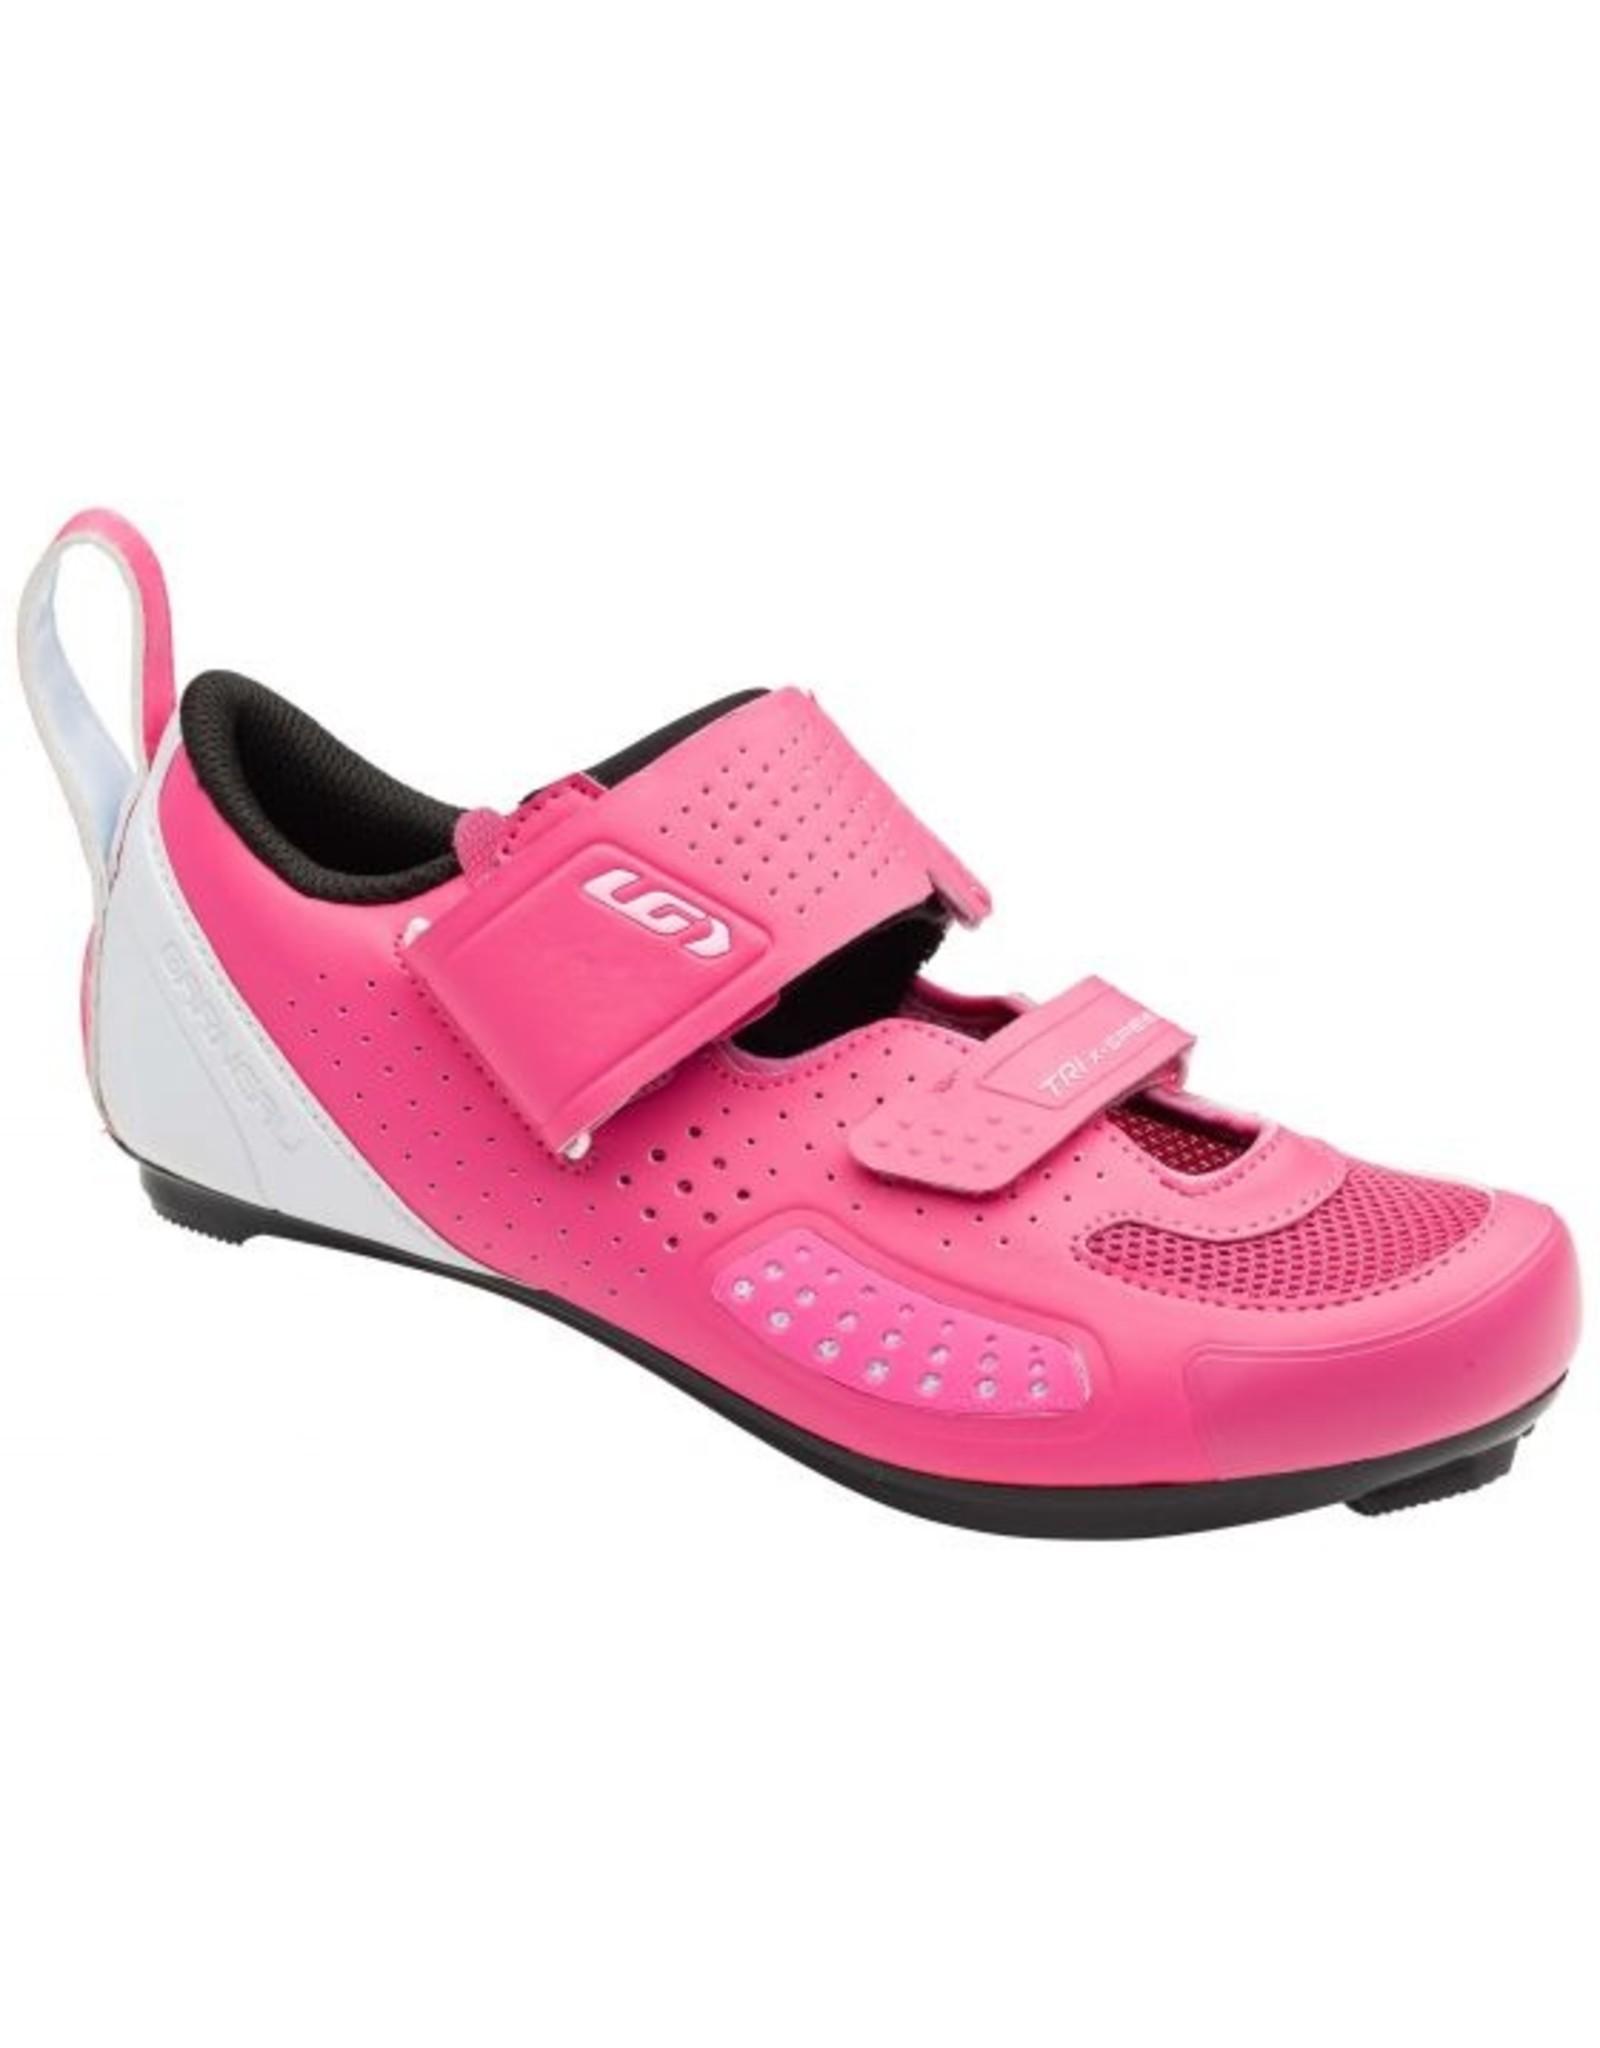 Chaussures de triathlon Tri X-Speed IV pour femmes